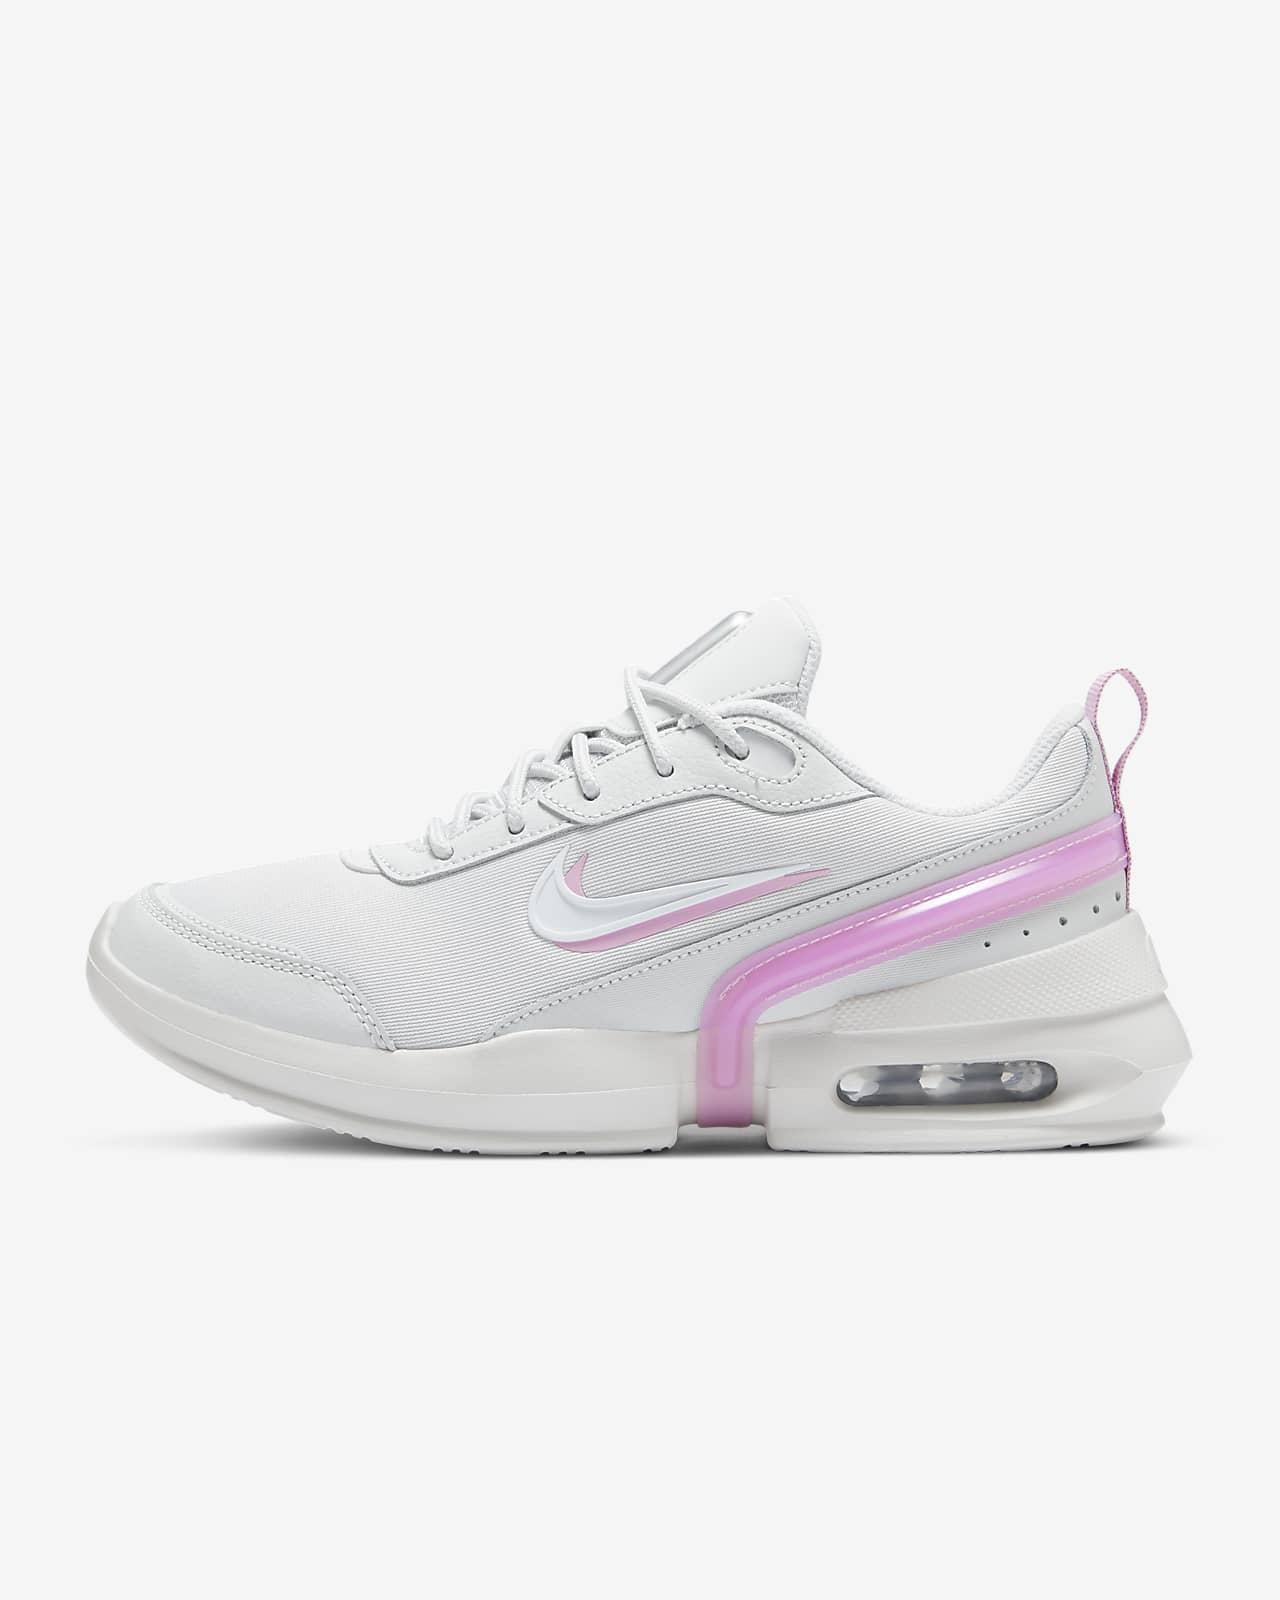 Nike Air Max Siren Women's Shoe